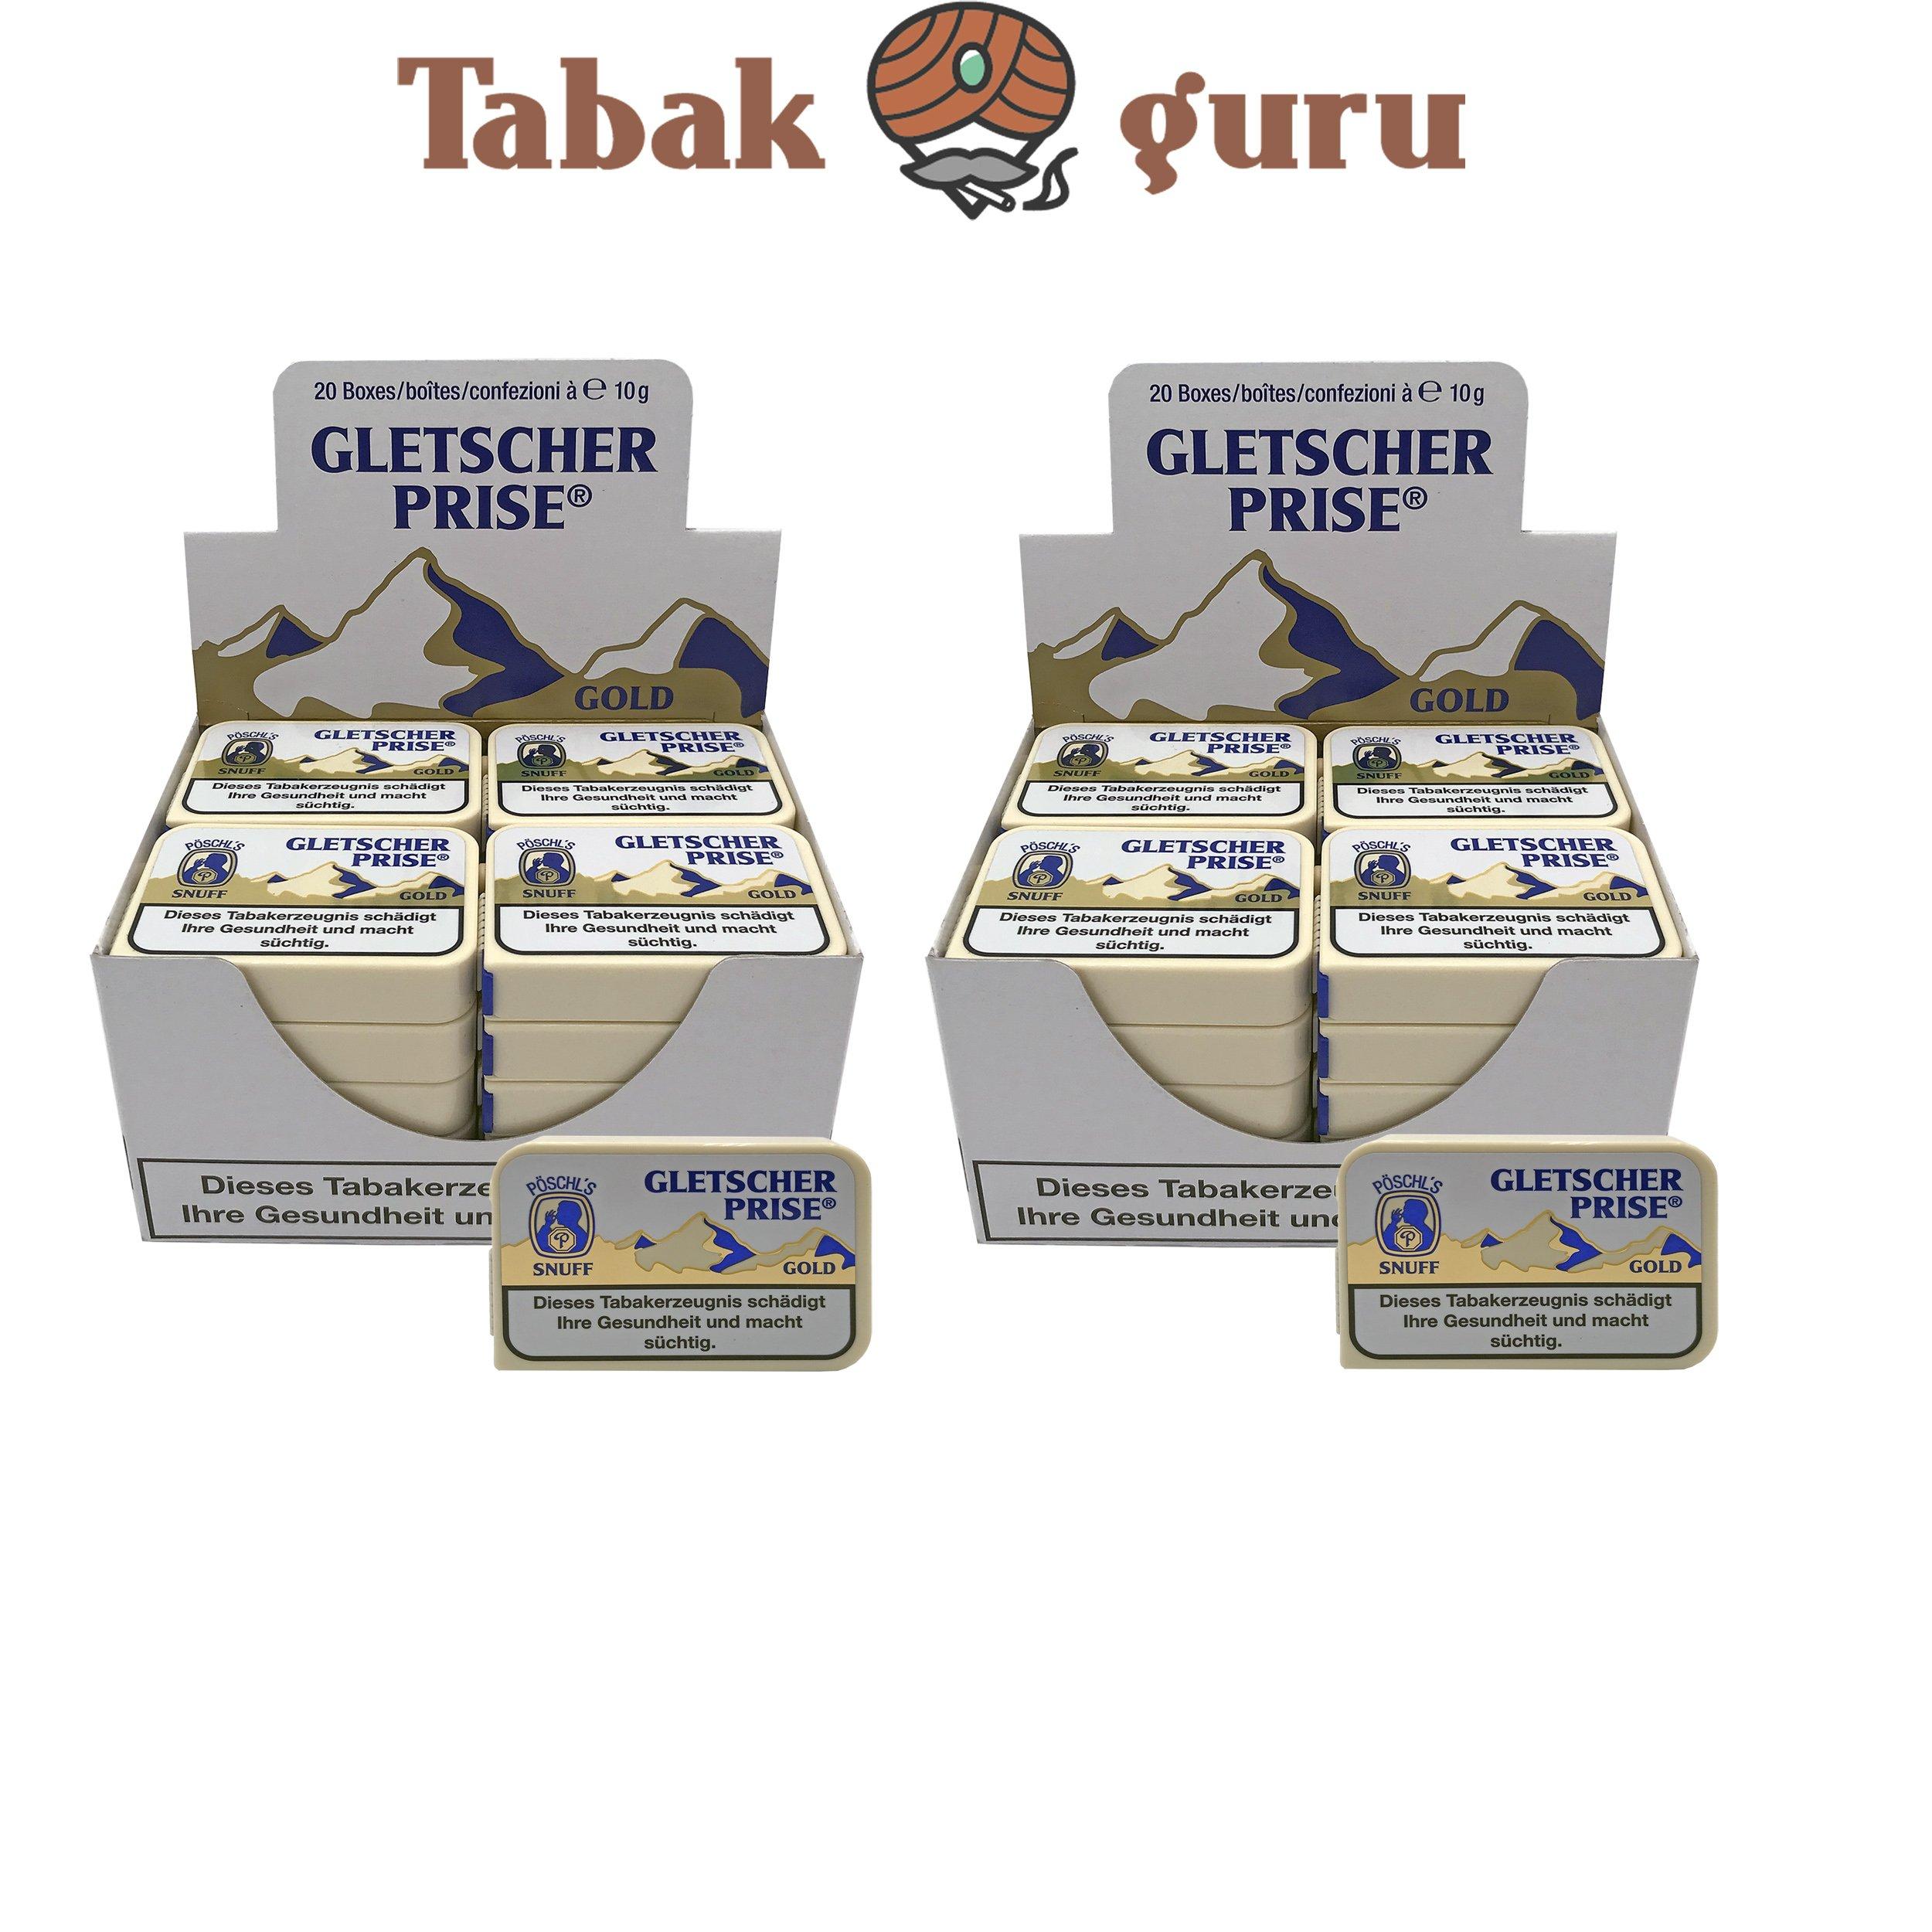 40x Gletscher Prise Gold Snuff Schnupftabak 10g Dose